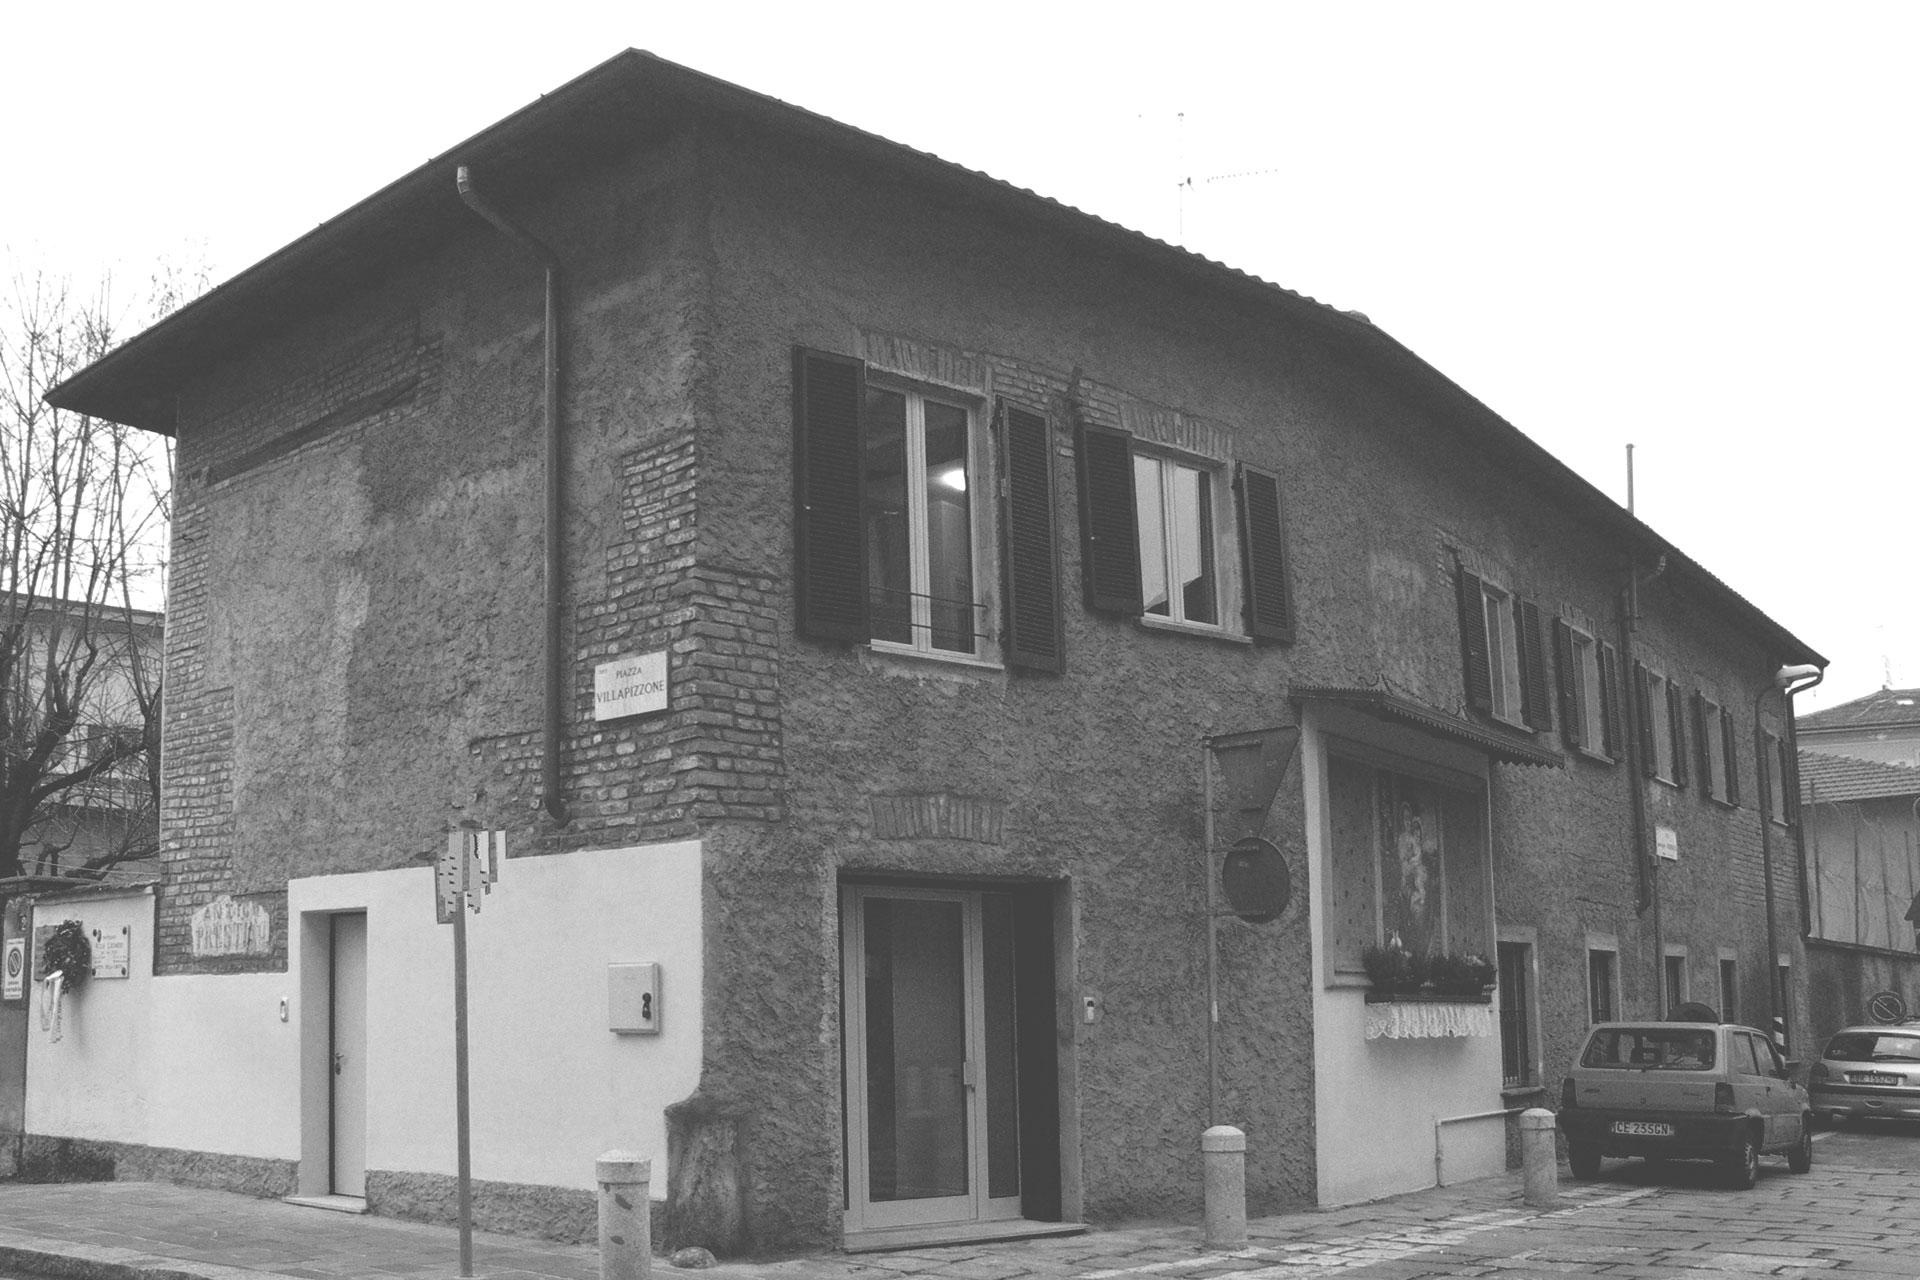 Cast Villapizzone